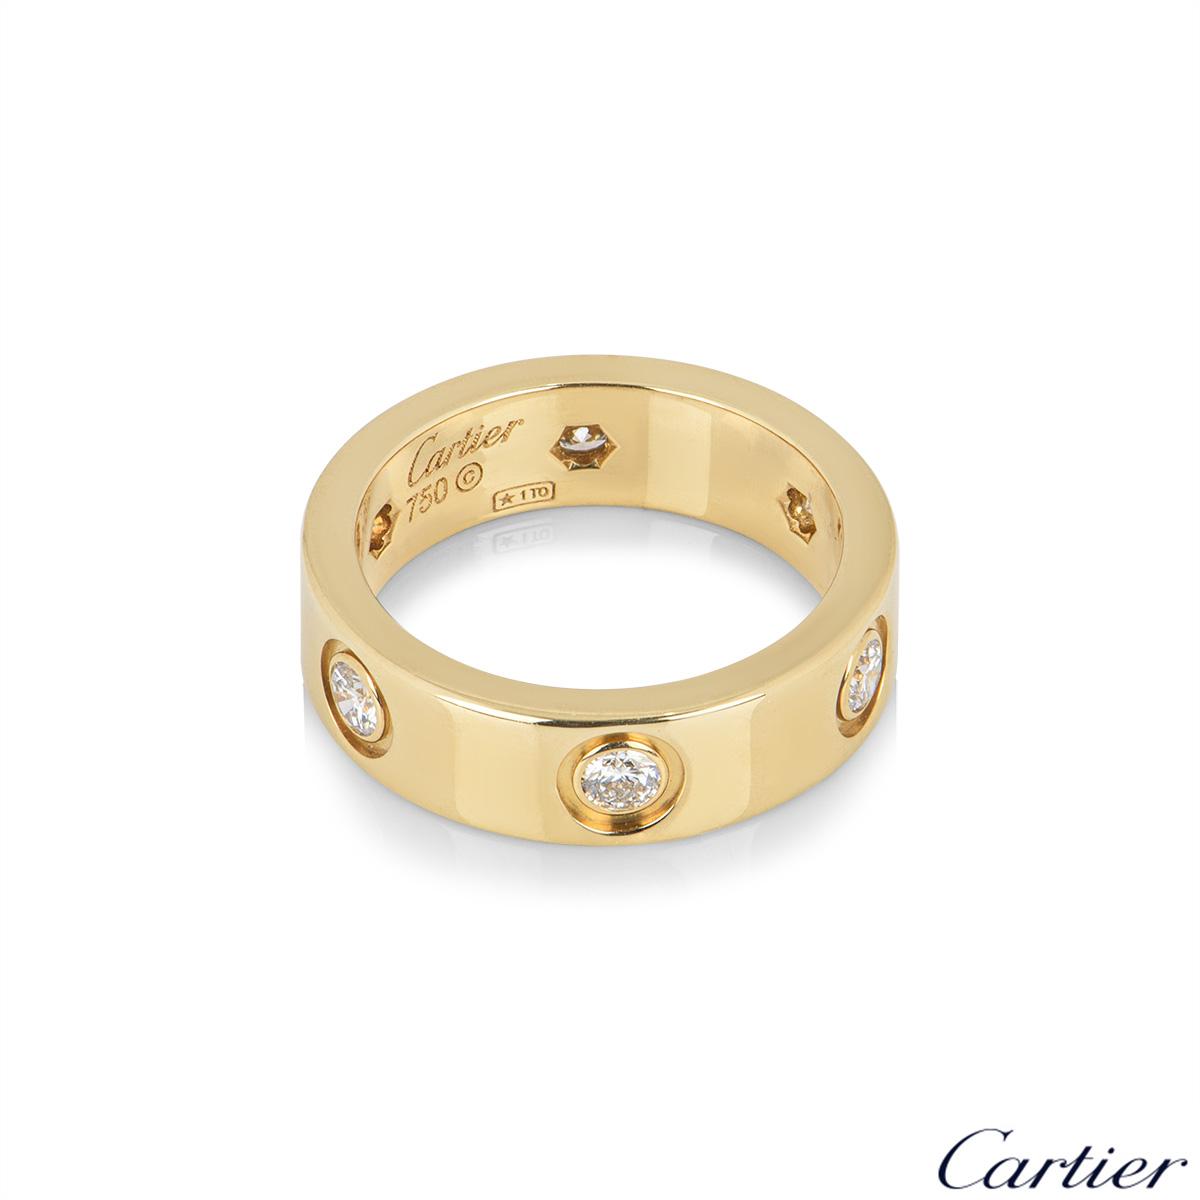 CartierYellow Gold Full Diamond Love Ring Size 57 B4025900